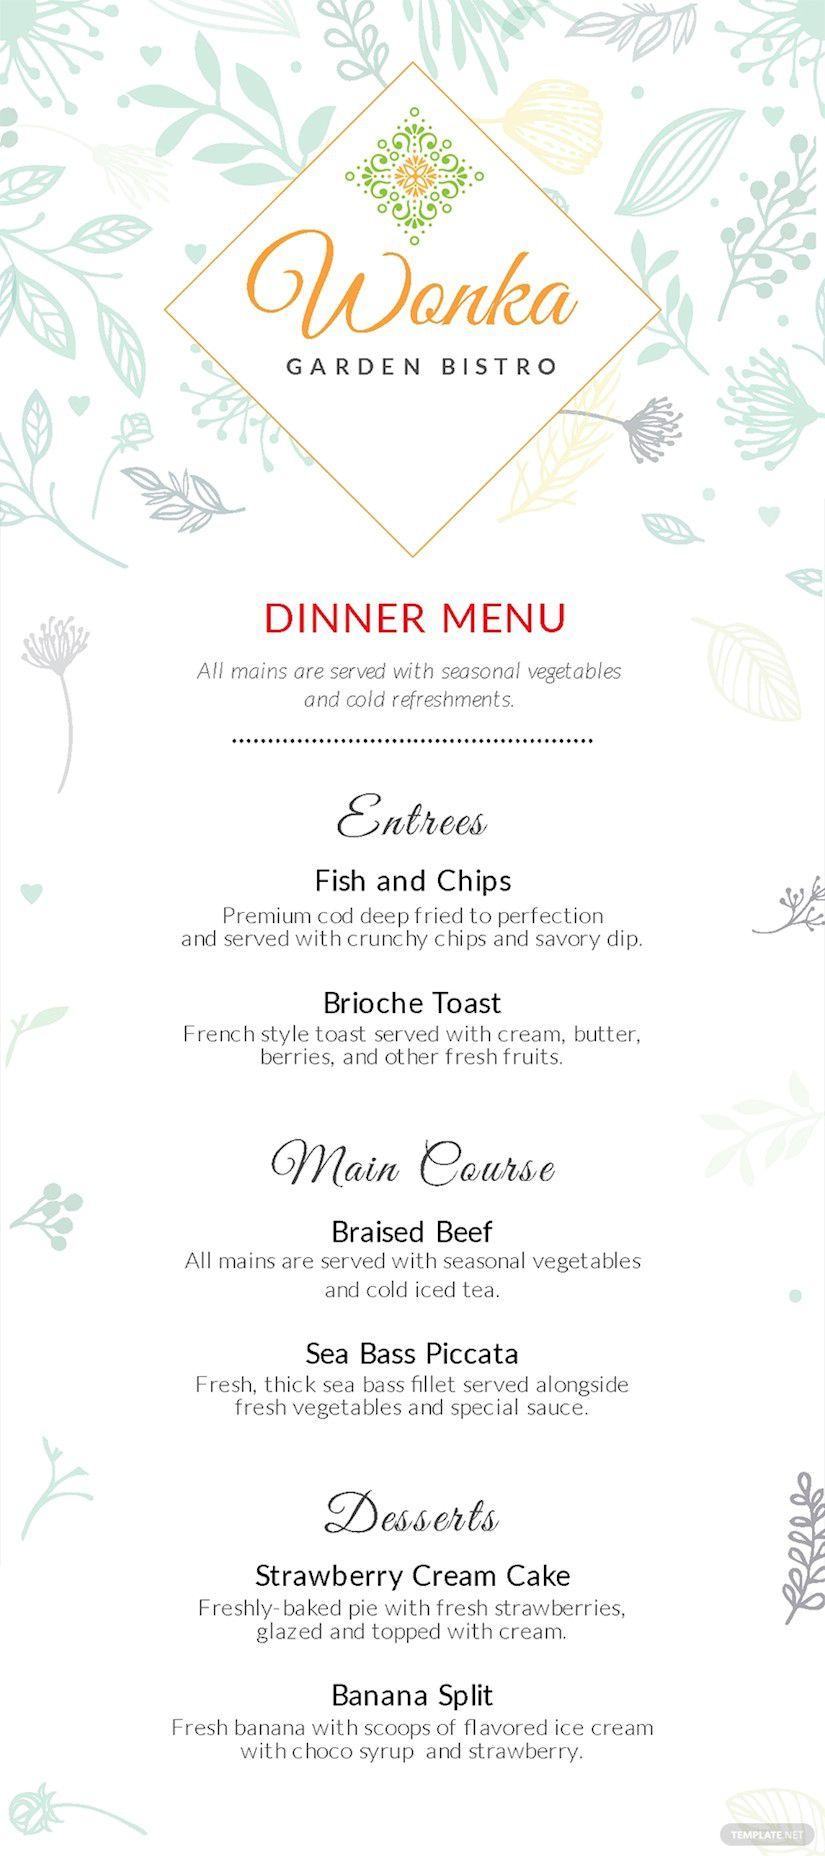 005 Shocking Dinner Party Menu Template High Def  Word Elegant Free Google DocFull